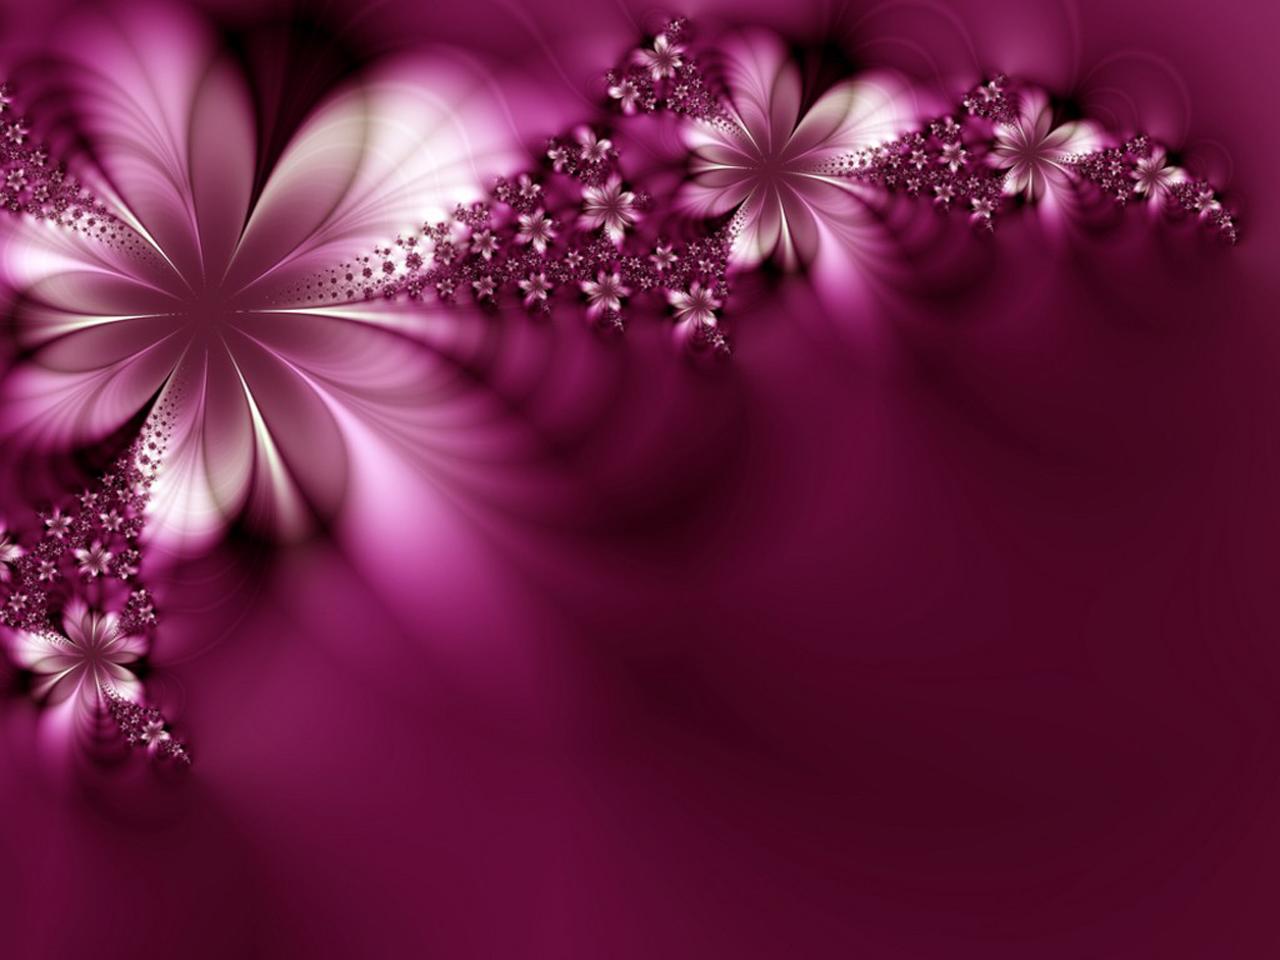 http://4.bp.blogspot.com/-TOXhYKP6Clg/TgnhLaOvhBI/AAAAAAAAEiY/0dHj2j8X5hY/s1600/purple-flower-1280x960-housepic.jpg